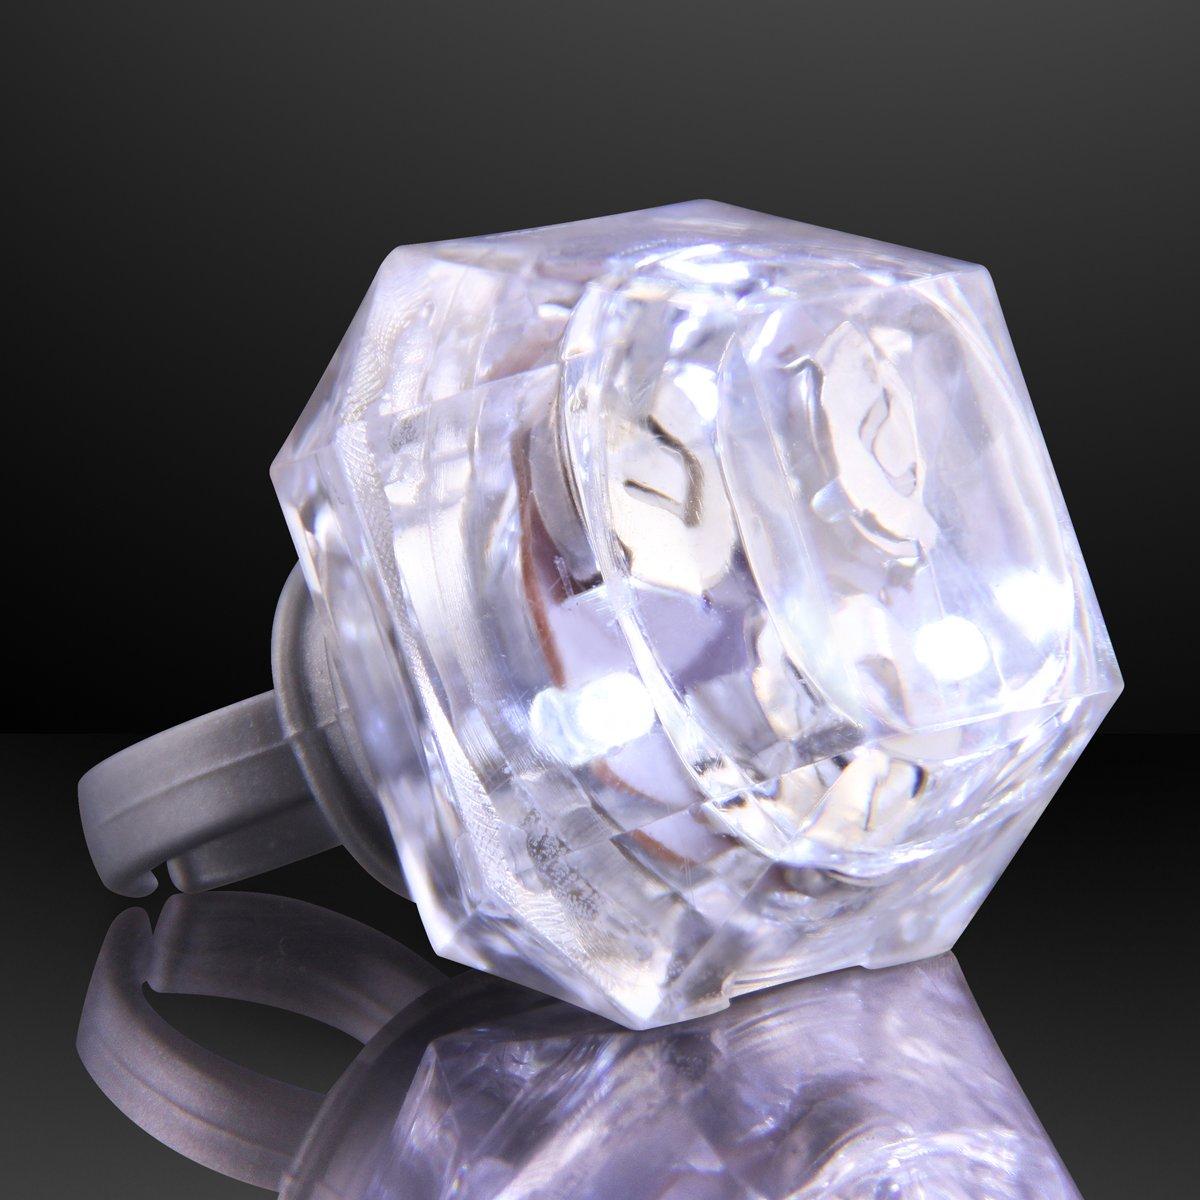 FlashingBlinkyLights Plastic Princess-Cut Huge Diamond Light Up Rings (Set of 24)